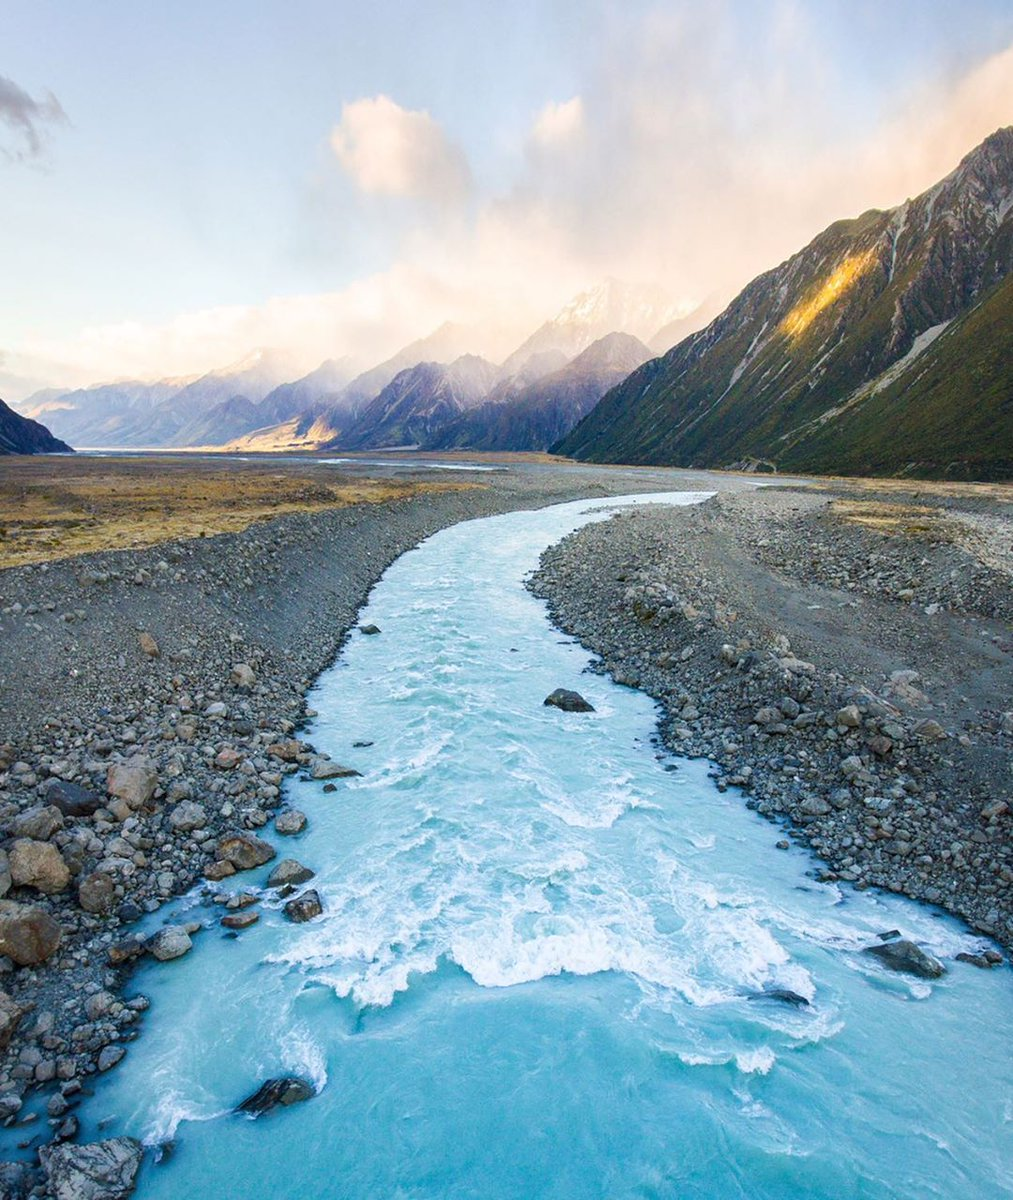 Blue Lakes and Tasman Glacier Walk, New Zealand   #SundayMorning pic.twitter.com/K2VRtsACCc